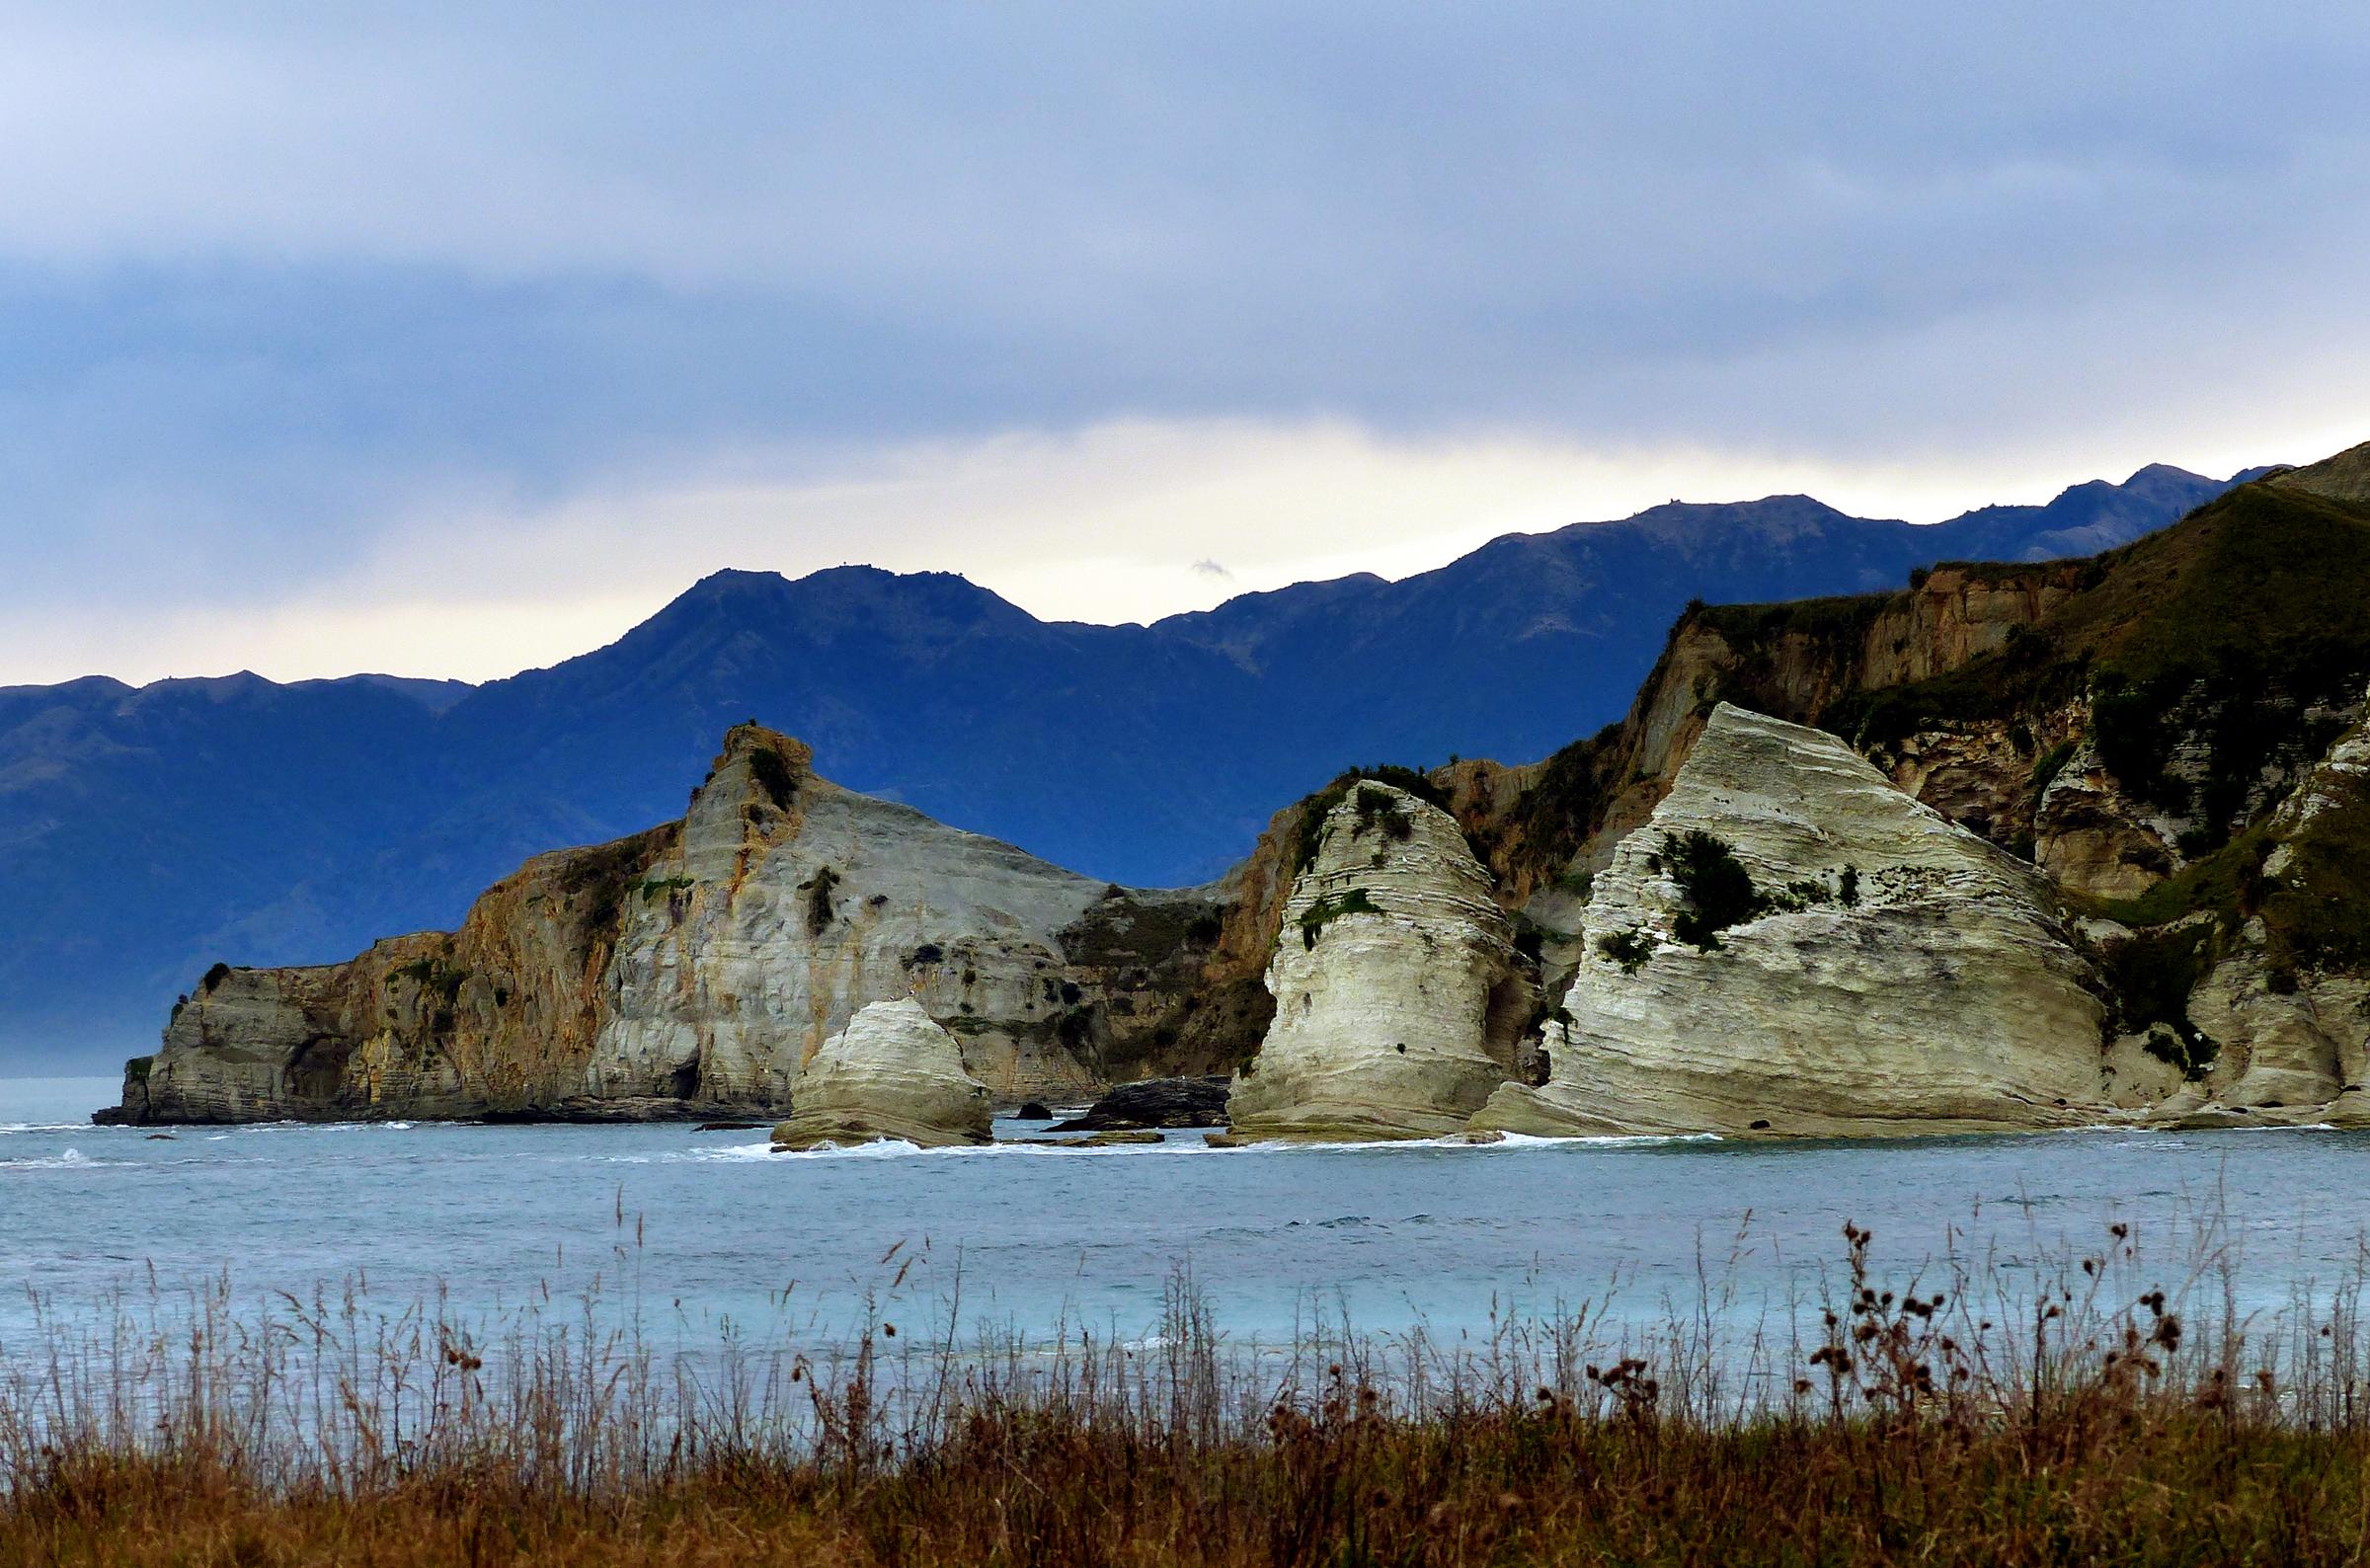 Free Images : landscape, sea, coast, nature, rock, wilderness, cloud